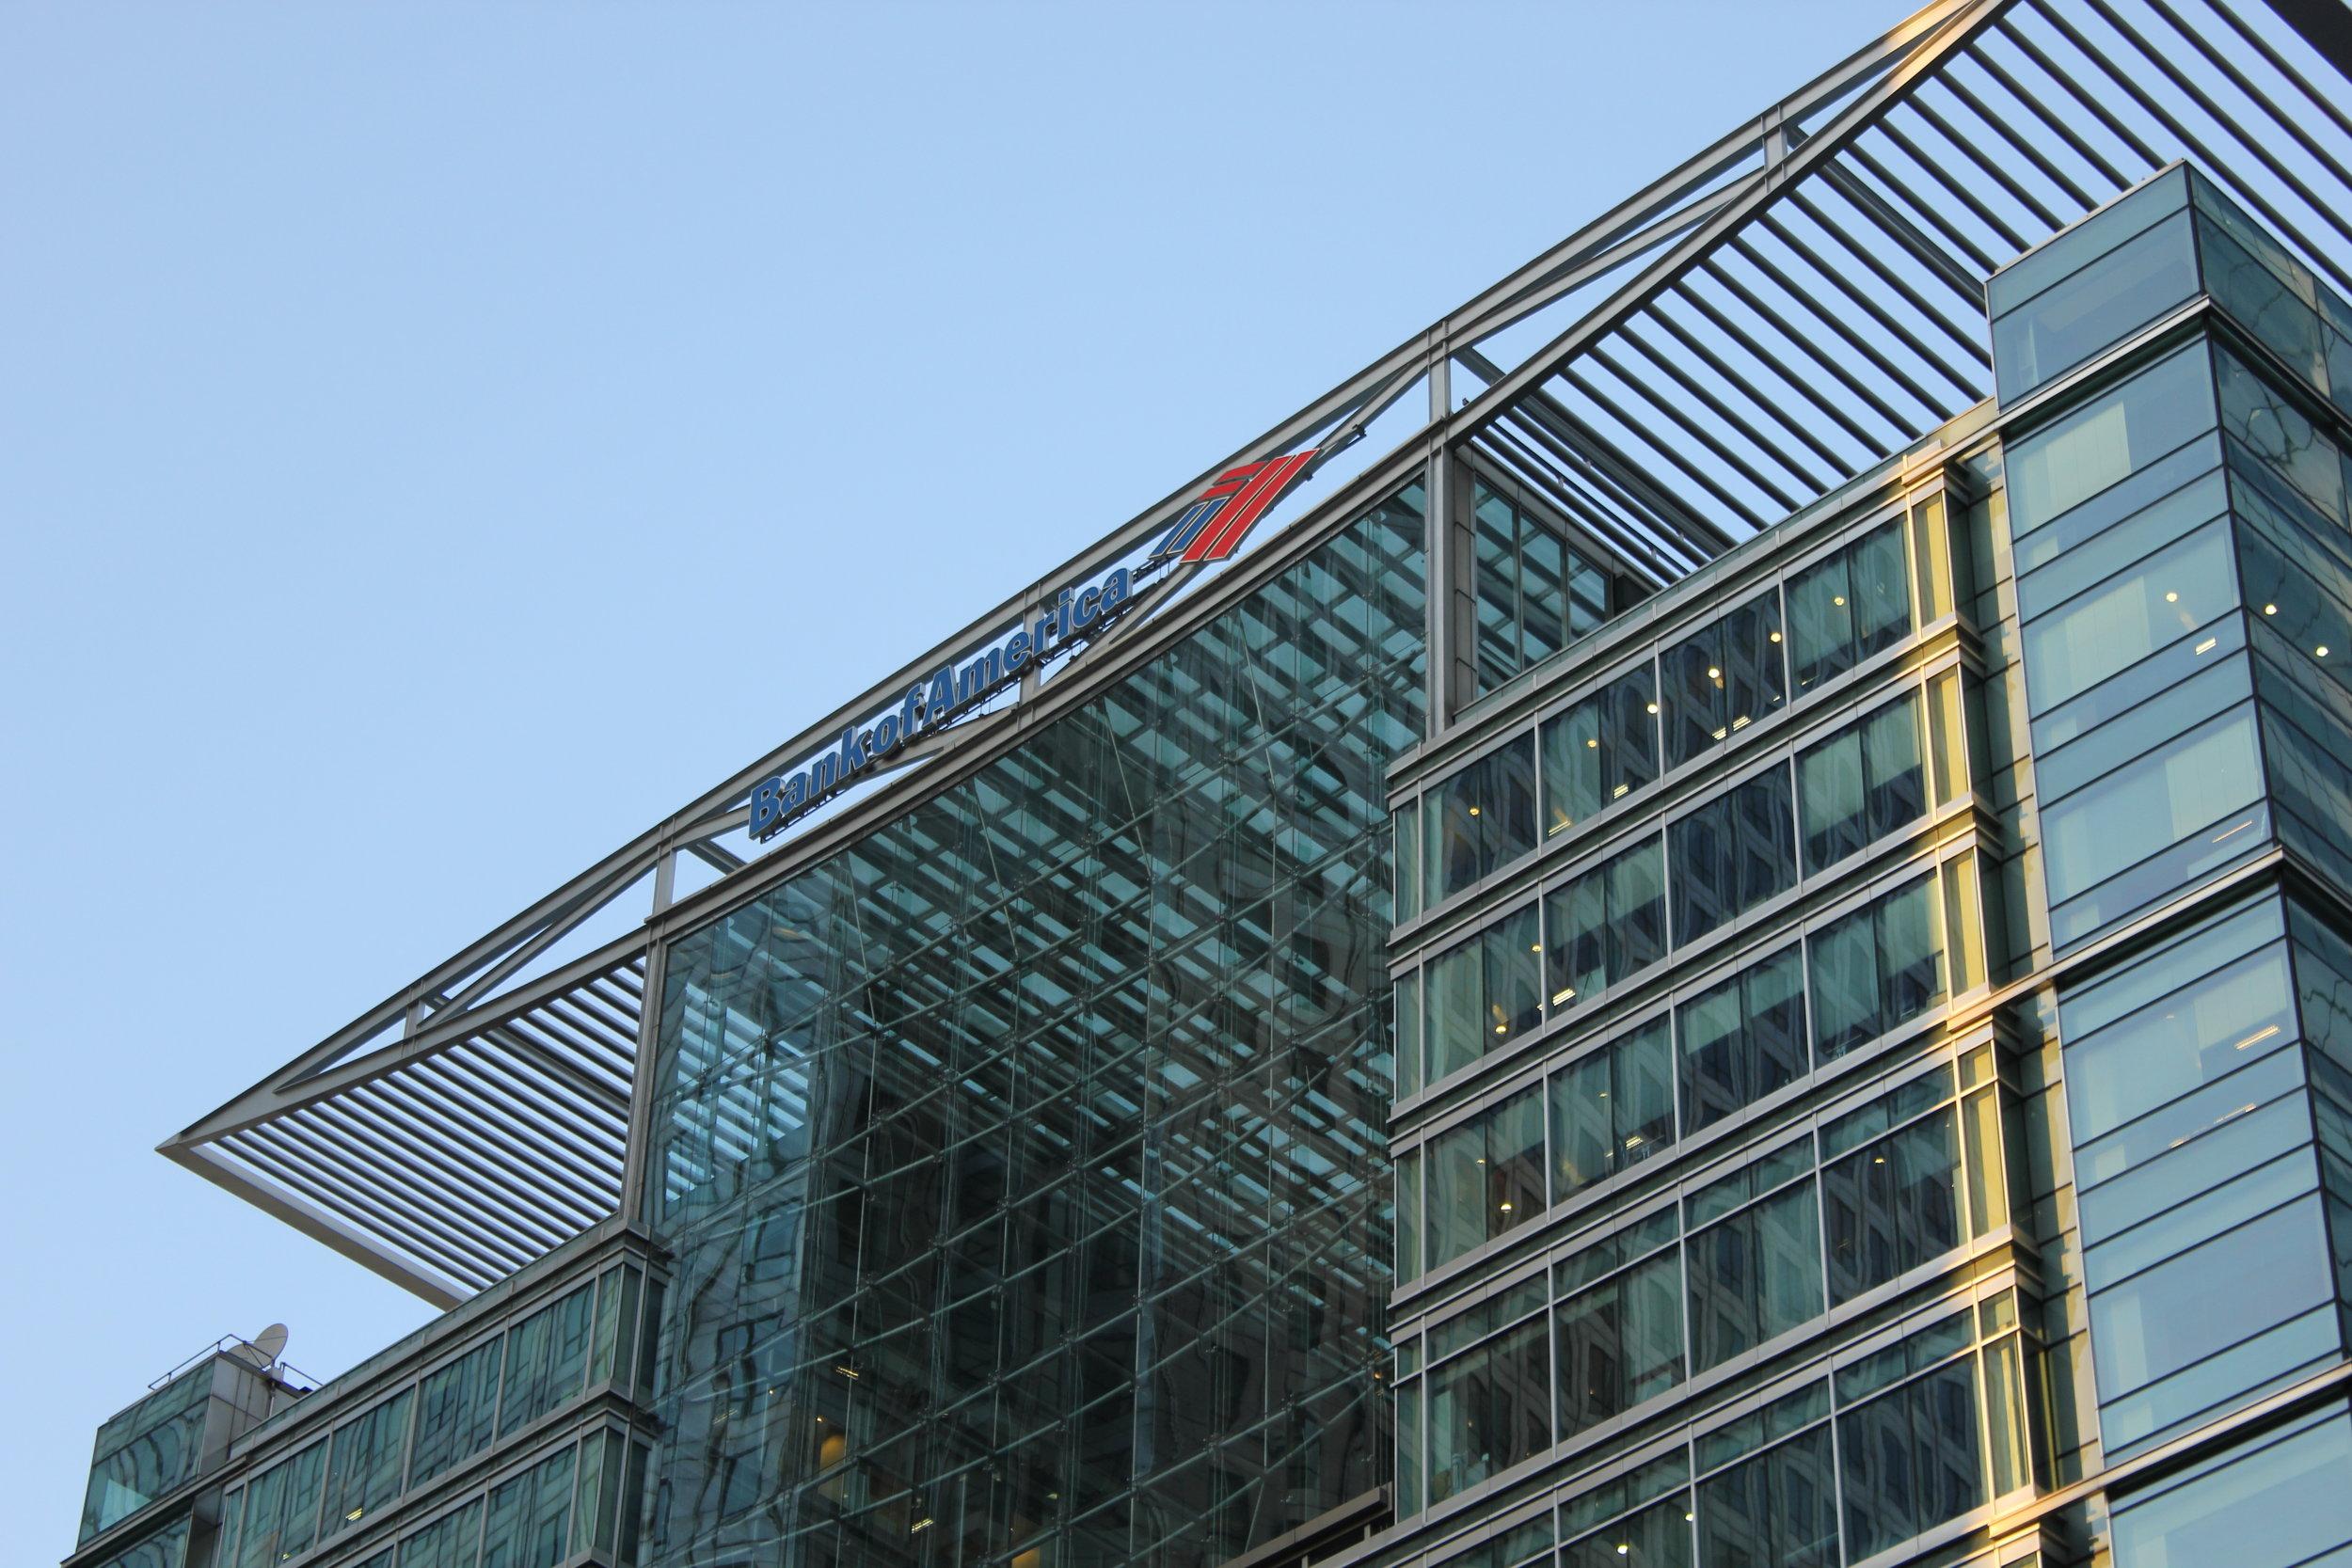 DS1 (5 Canada Square), London